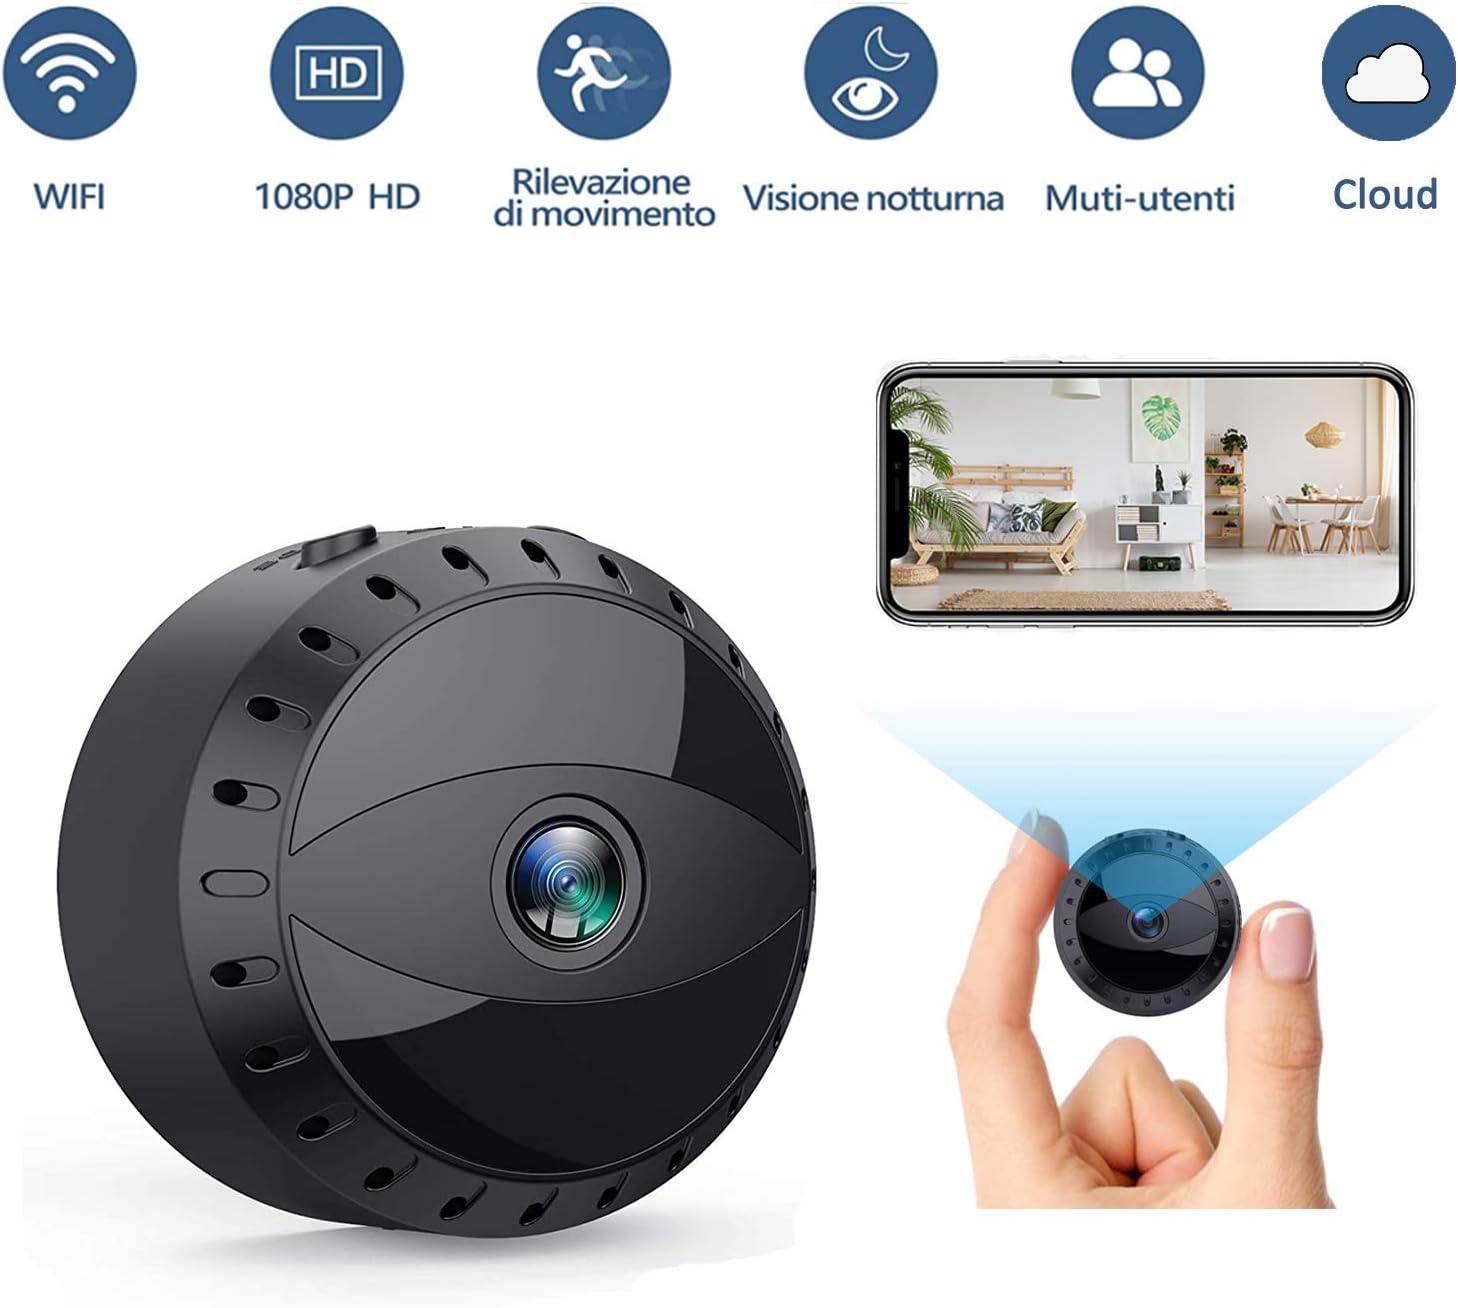 Tesecu - Mini microcámaras espía 1080P HD botón Oculto cámara WiFi IP inalámbrica detección de Movimiento portátil videocámara con visión Nocturna vídeo Grabador